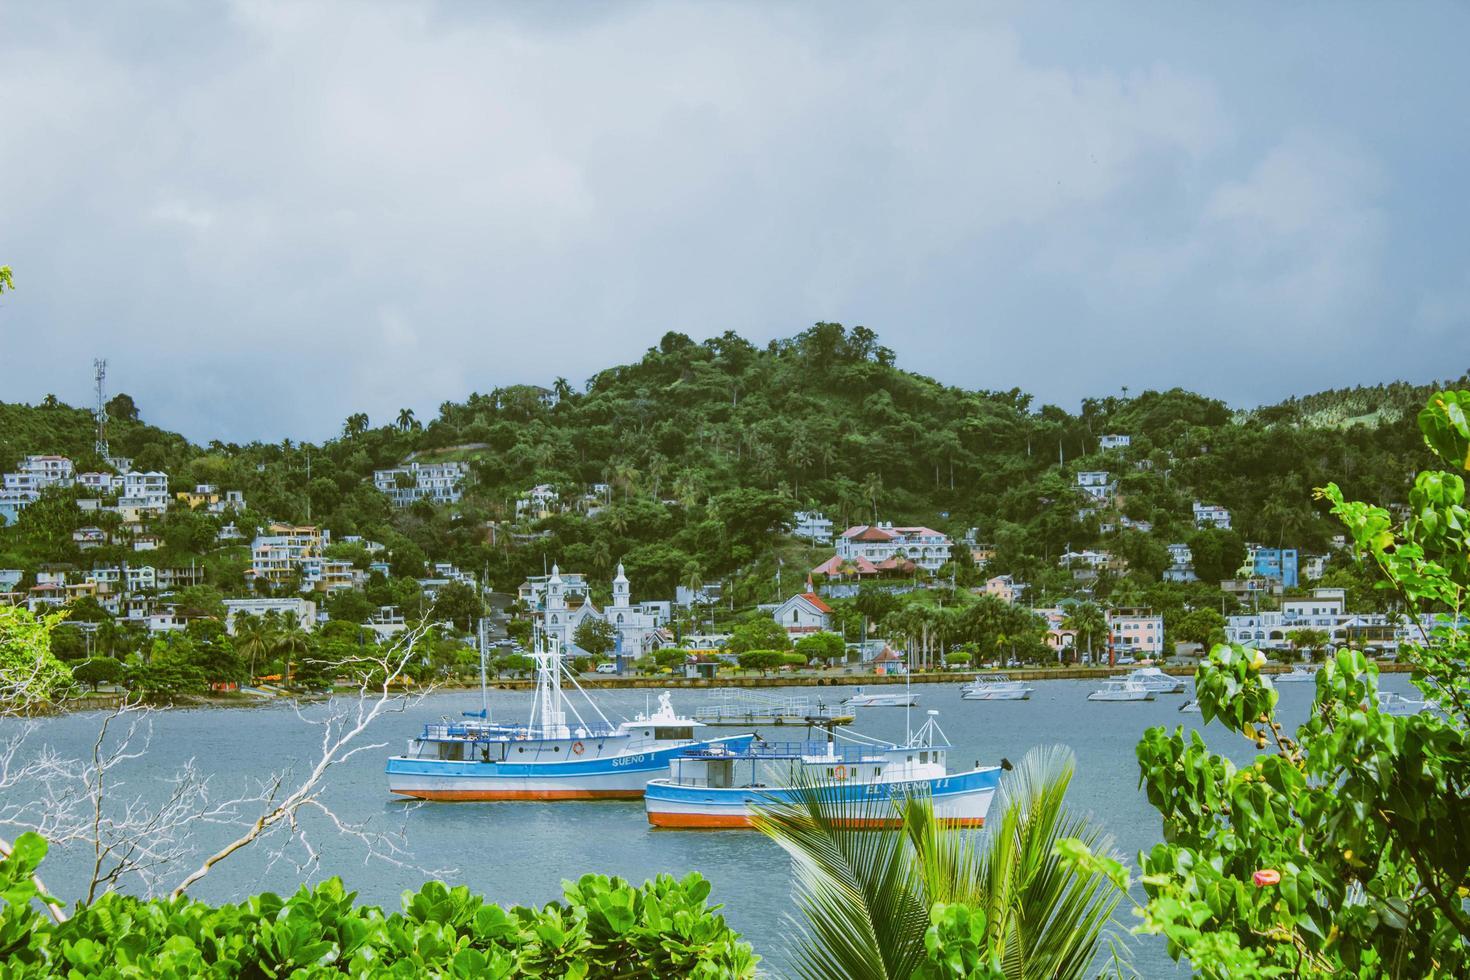 Santo Domingo, Dominican Republic, 2020 - Boats on the water photo